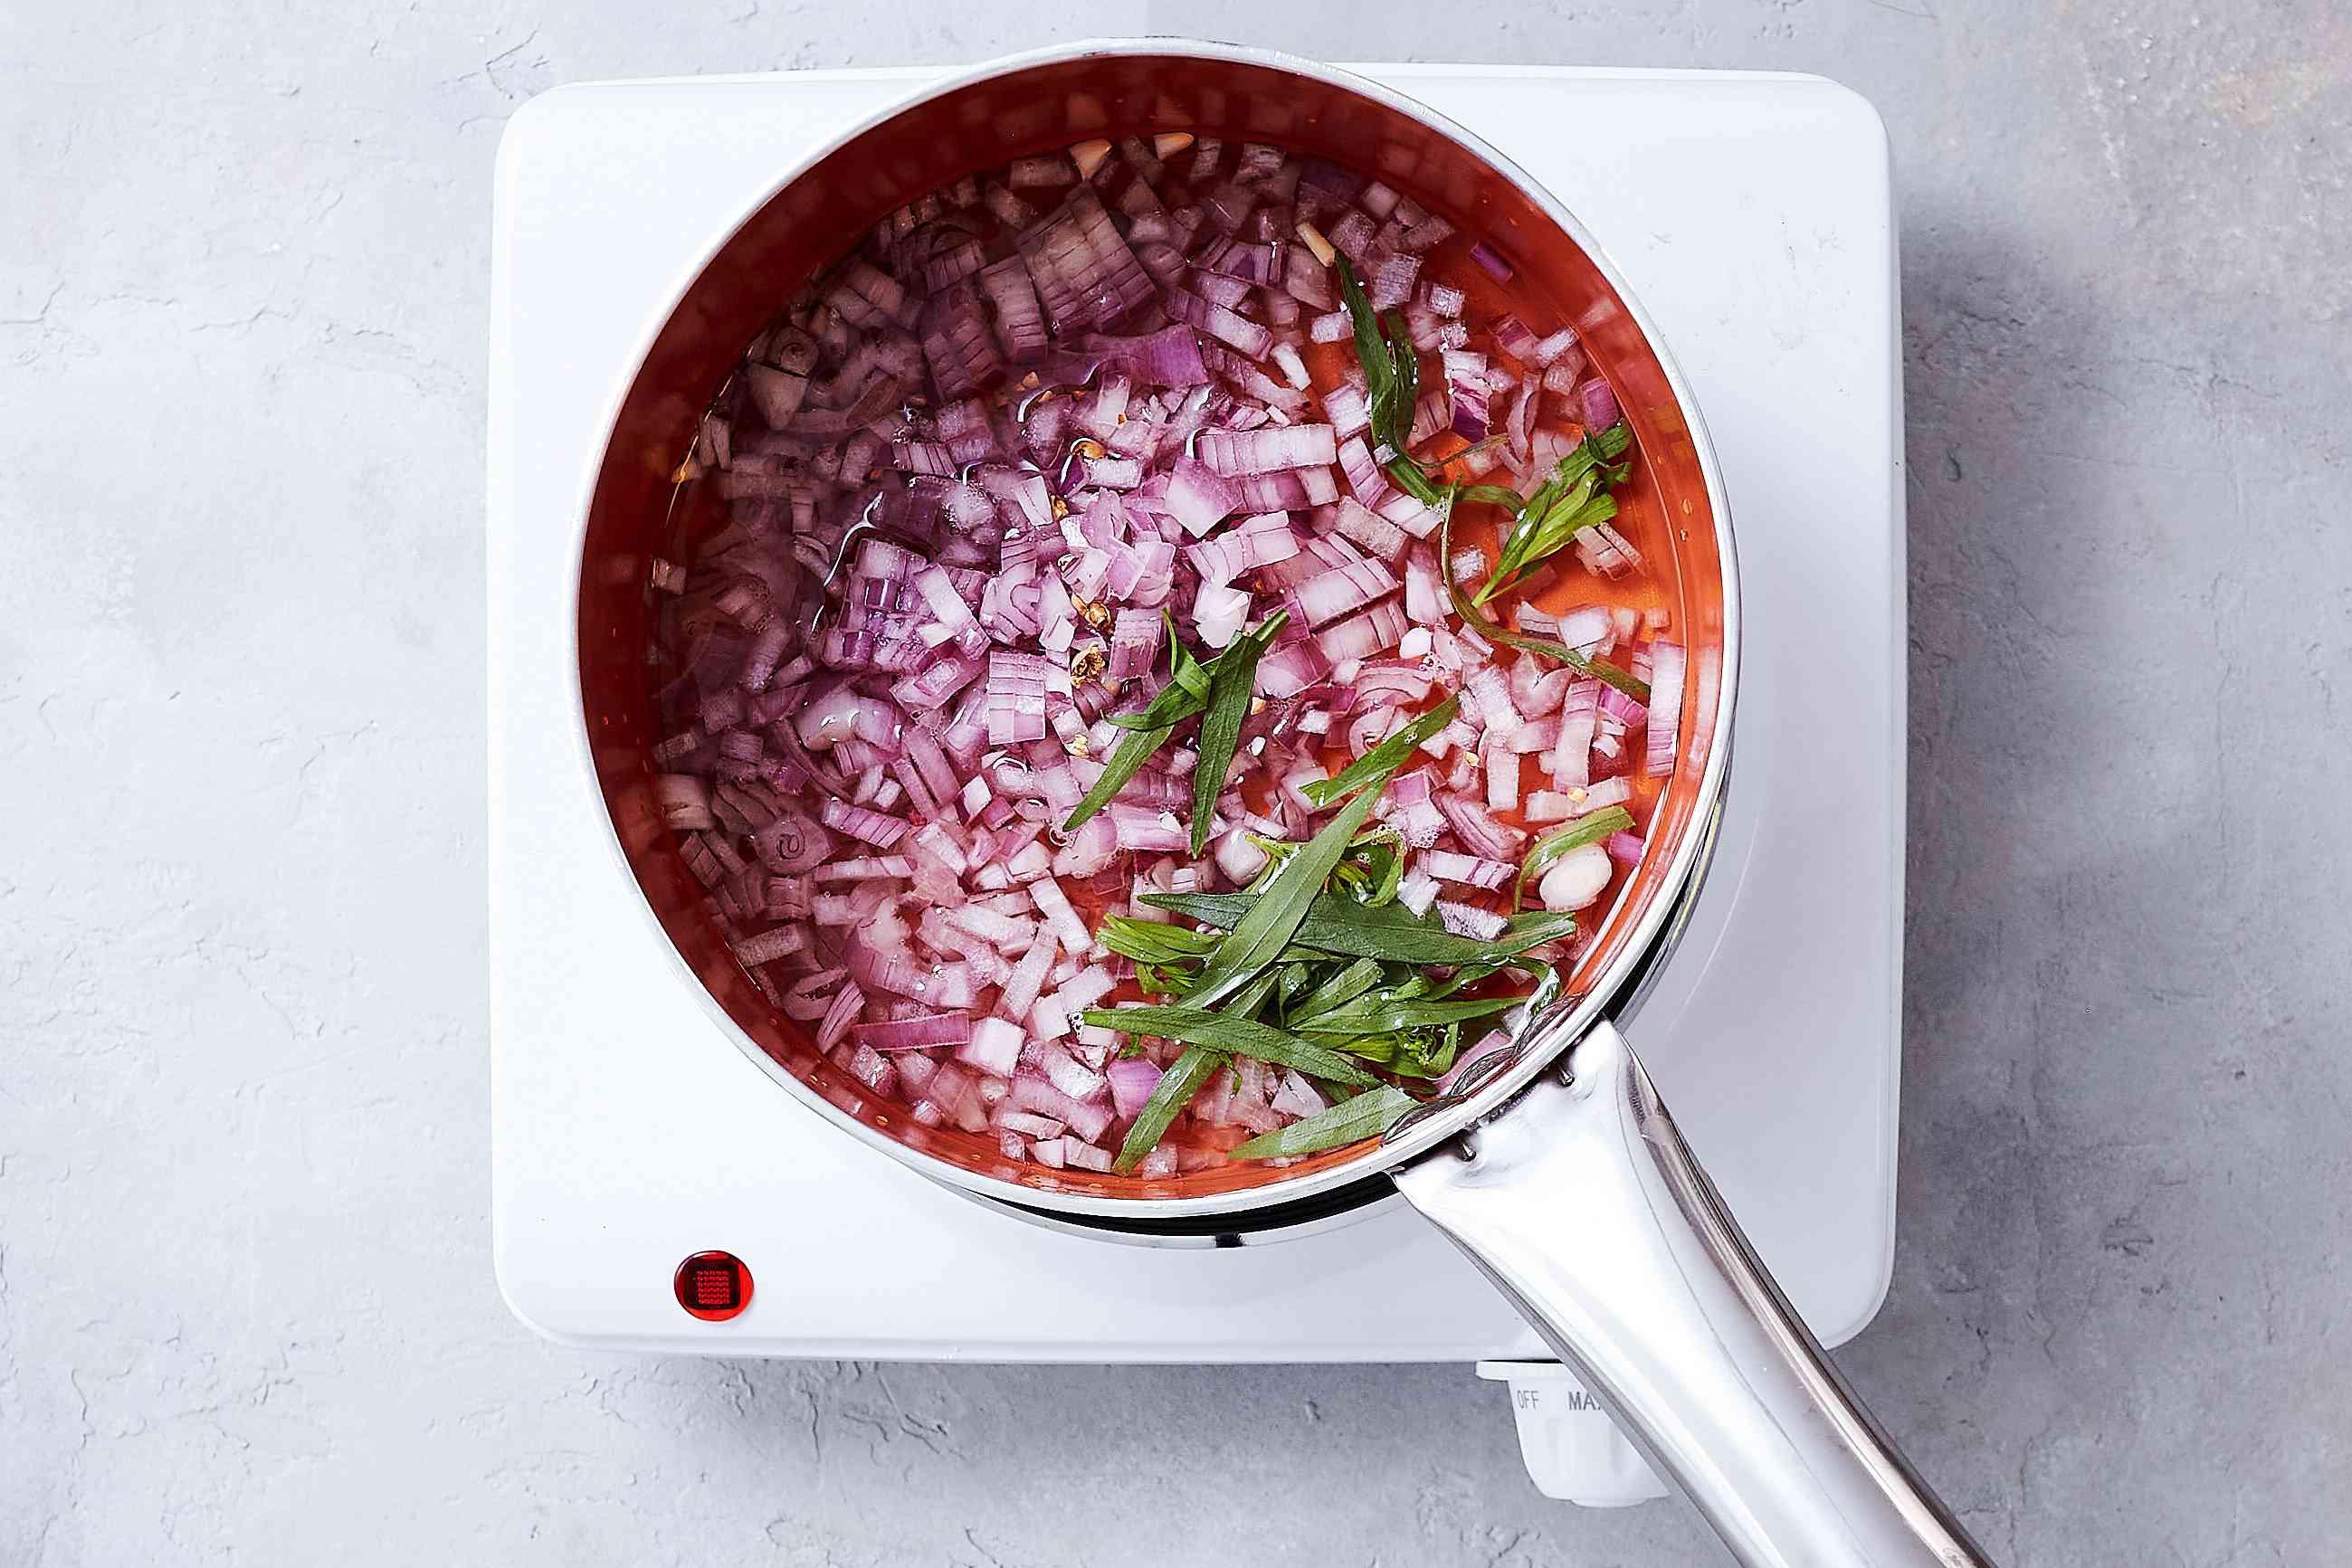 Vinegar, wine, shallots, tarragon, and peppercorns in a saucepan